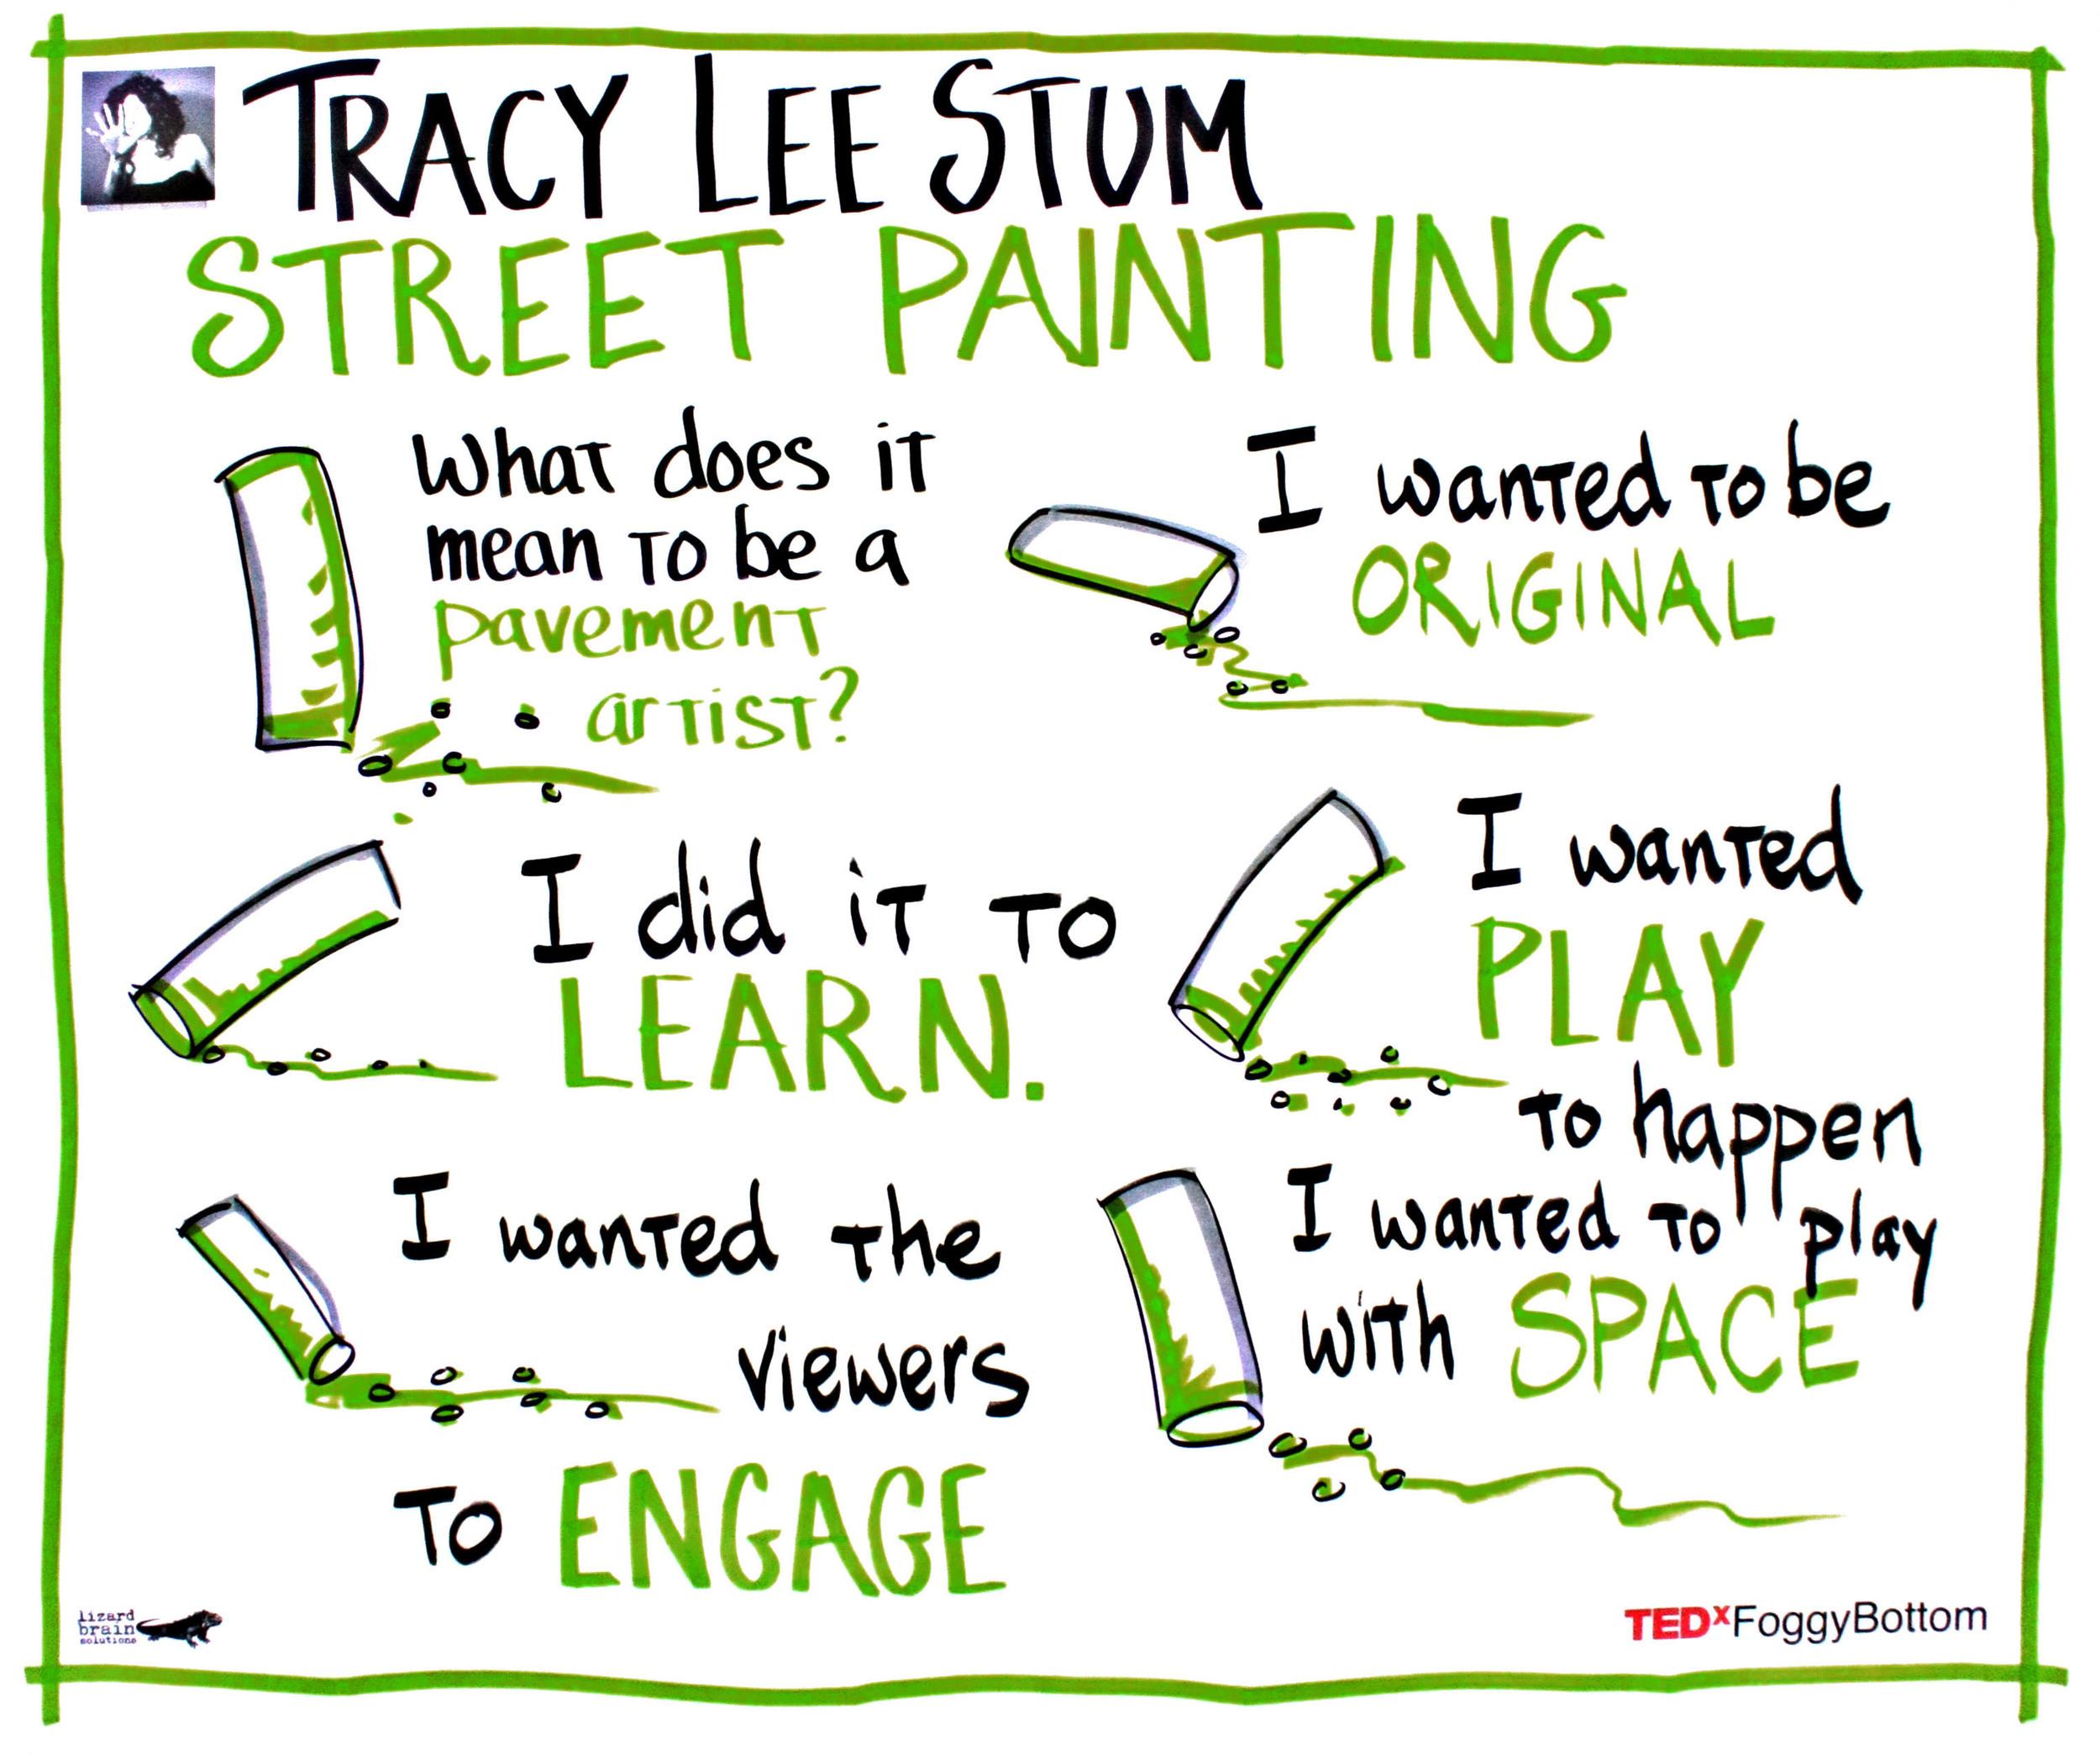 08 Tracy Lee Stum.jpg